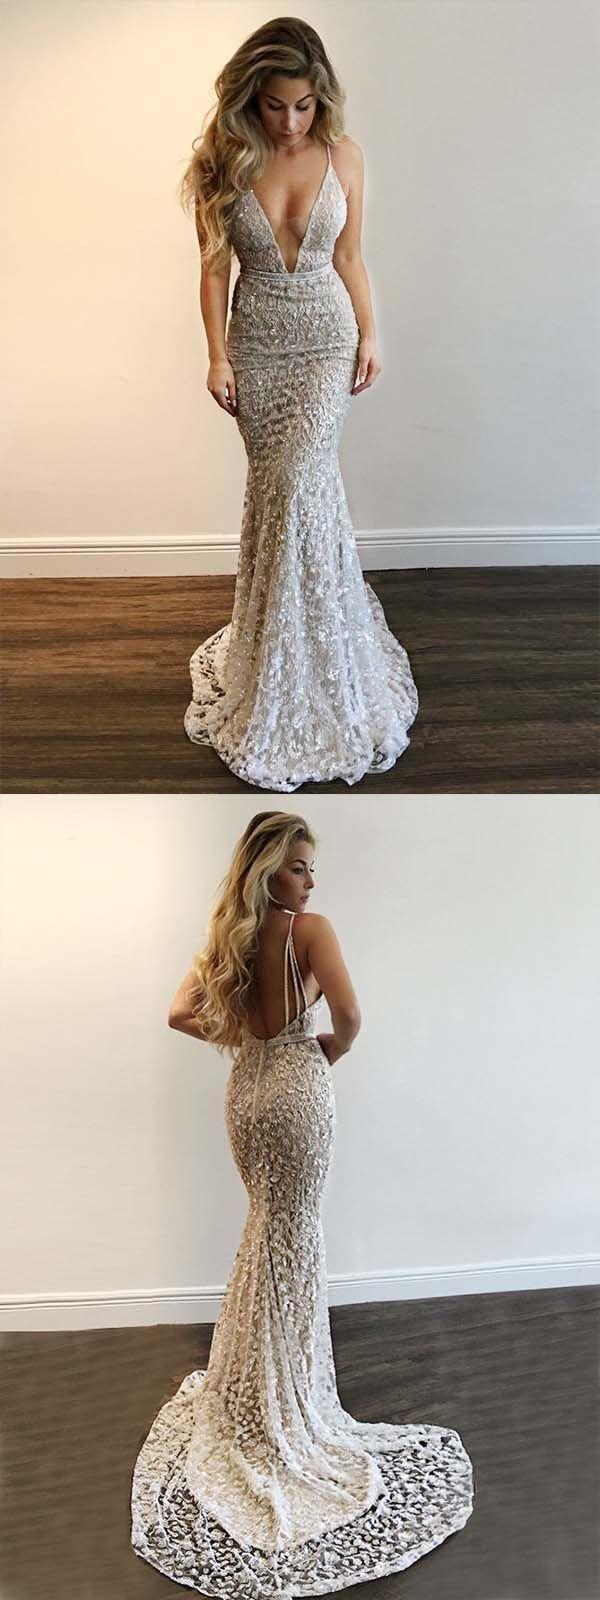 Mermaid deep vneck backless sweep train silver lace prom dress